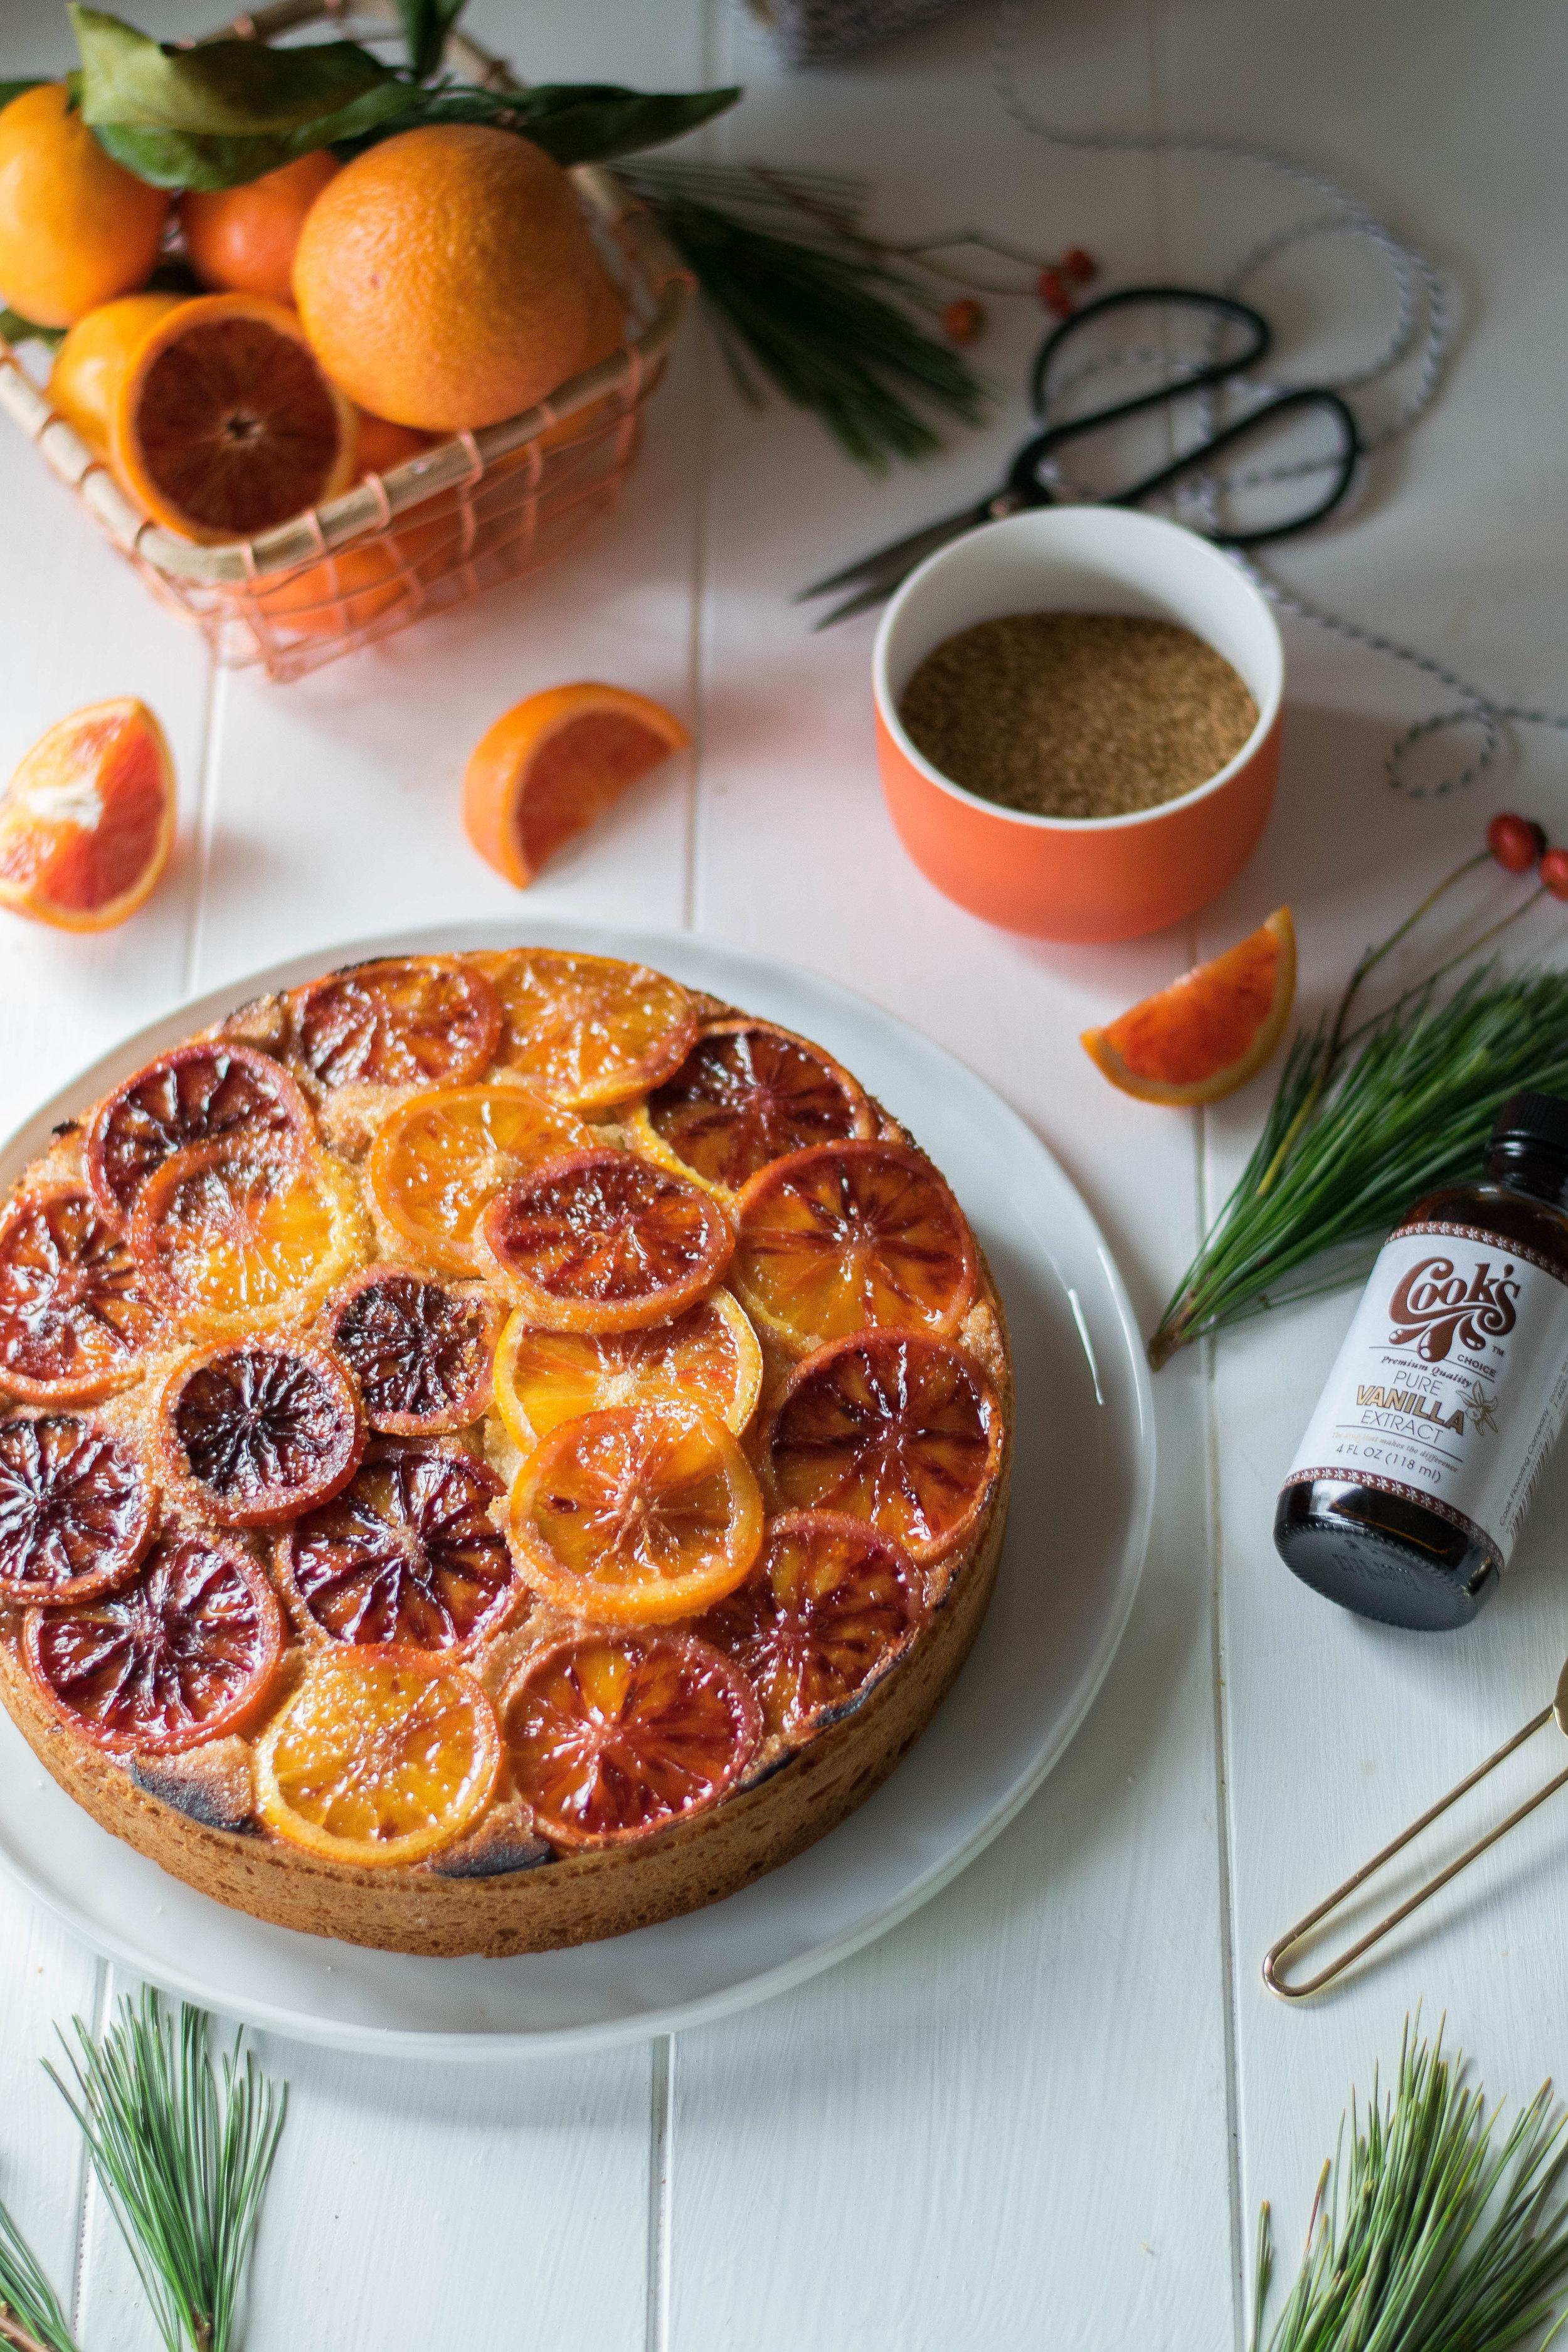 Brûléed Vanilla + Blood Orange Christmas Coffee Cake // Sponsored by Cook Flavoring Company | All Purpose Flour Child